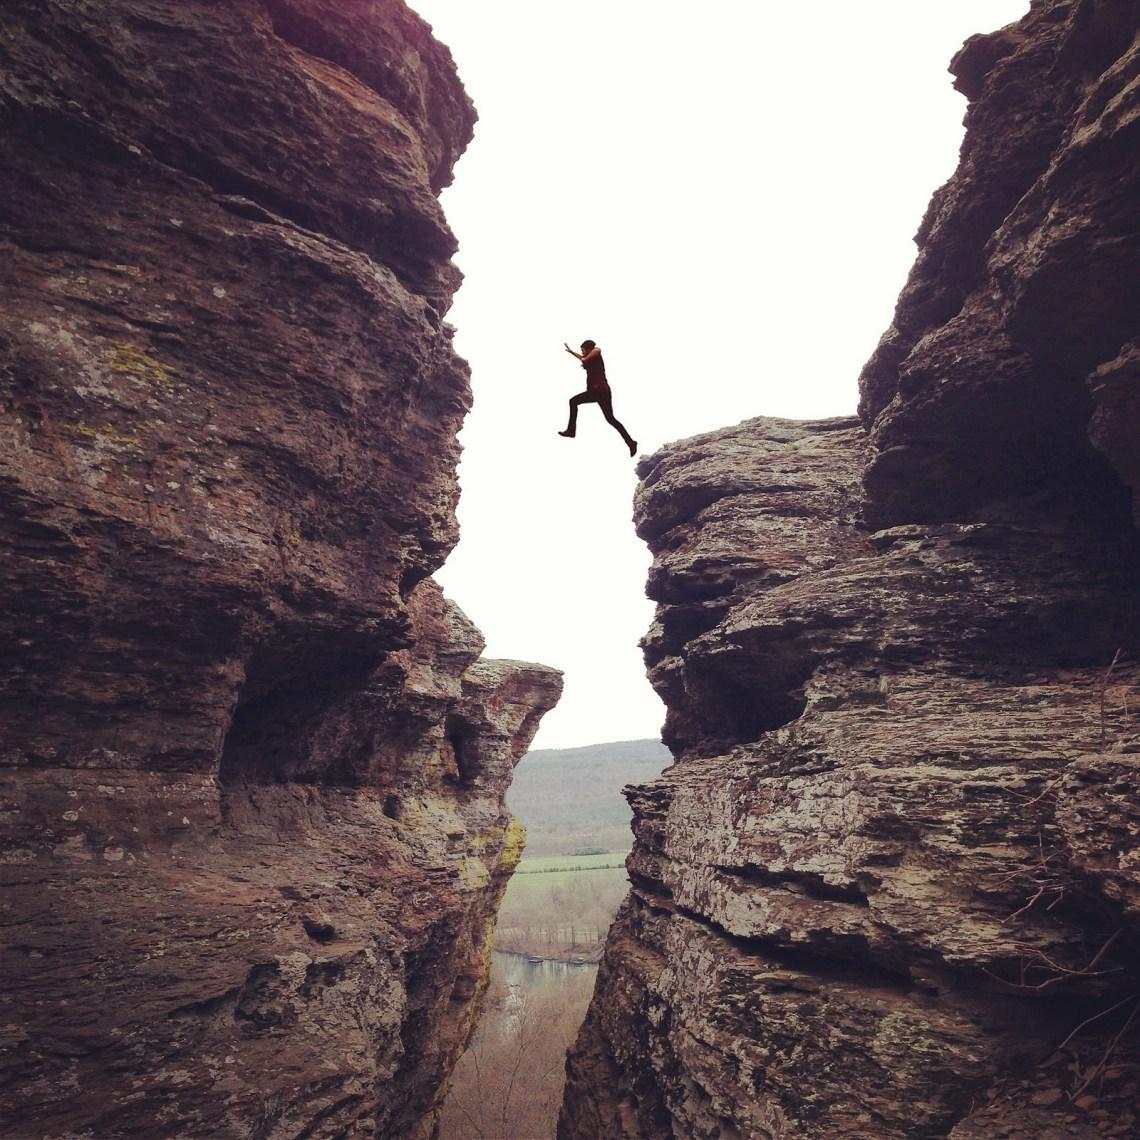 brenton_clarke / Livestock - www.lightstock.com/photos/man-taking-a-leap-of-faith